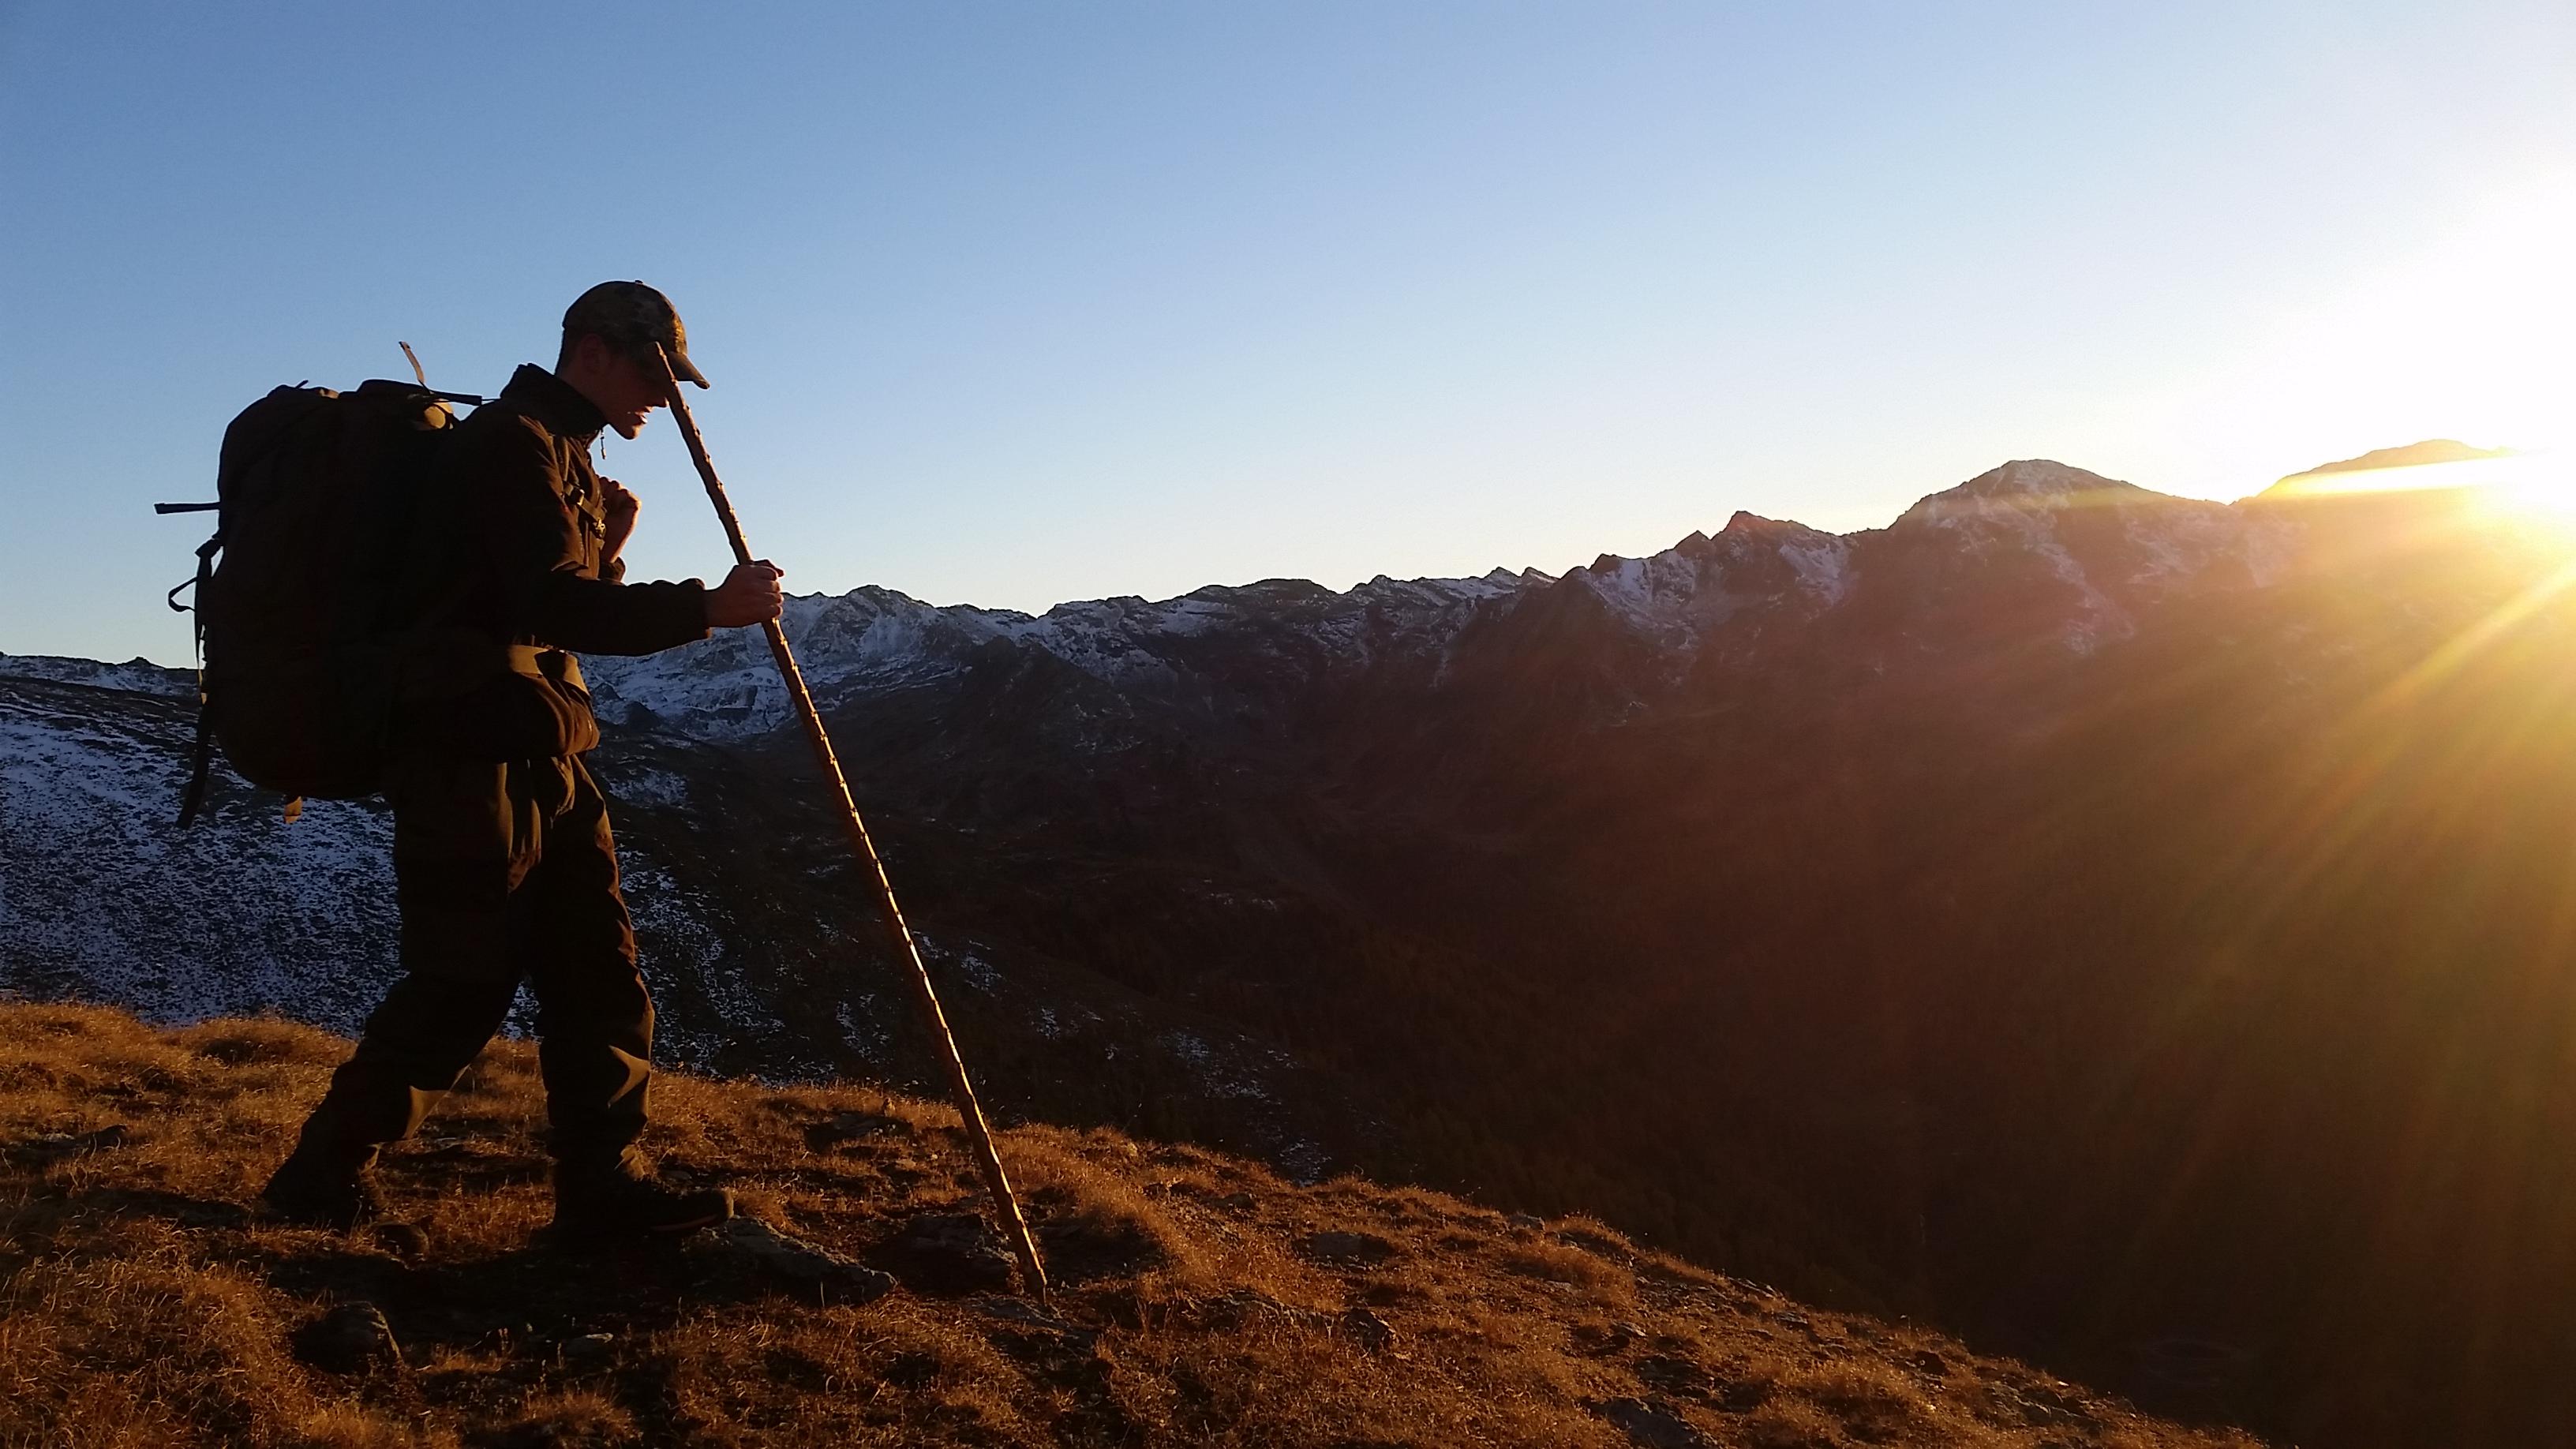 Bei Sonnenuntergang waren wir an der Berghütte mit Gams Jagd jagen jäger jaegermagazin Gamsjagd Wilddiebe